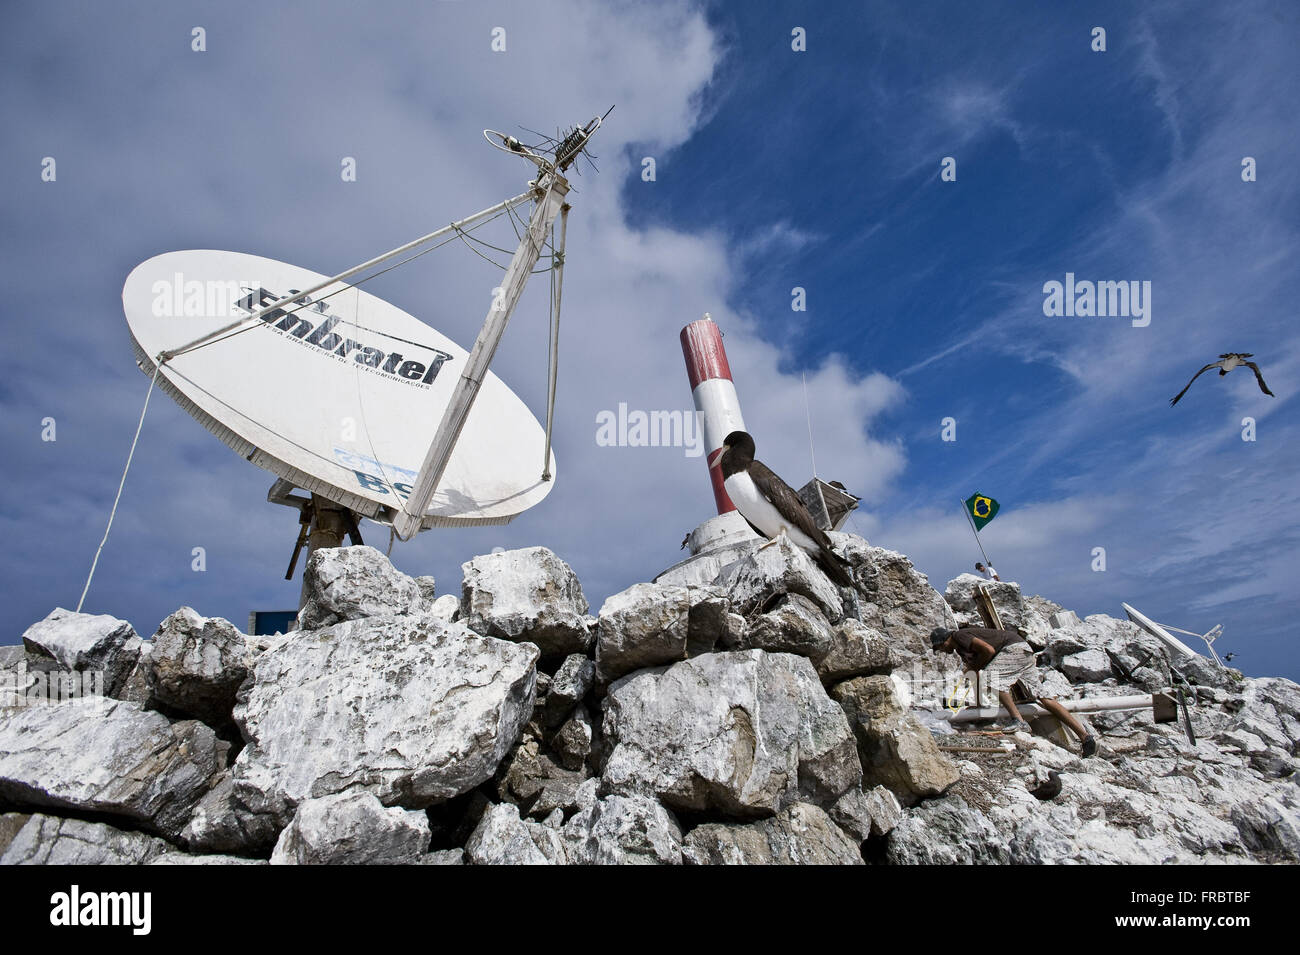 Telecommunications antenna in the Brazilian railway Scientific Belmonte Island - Stock Image